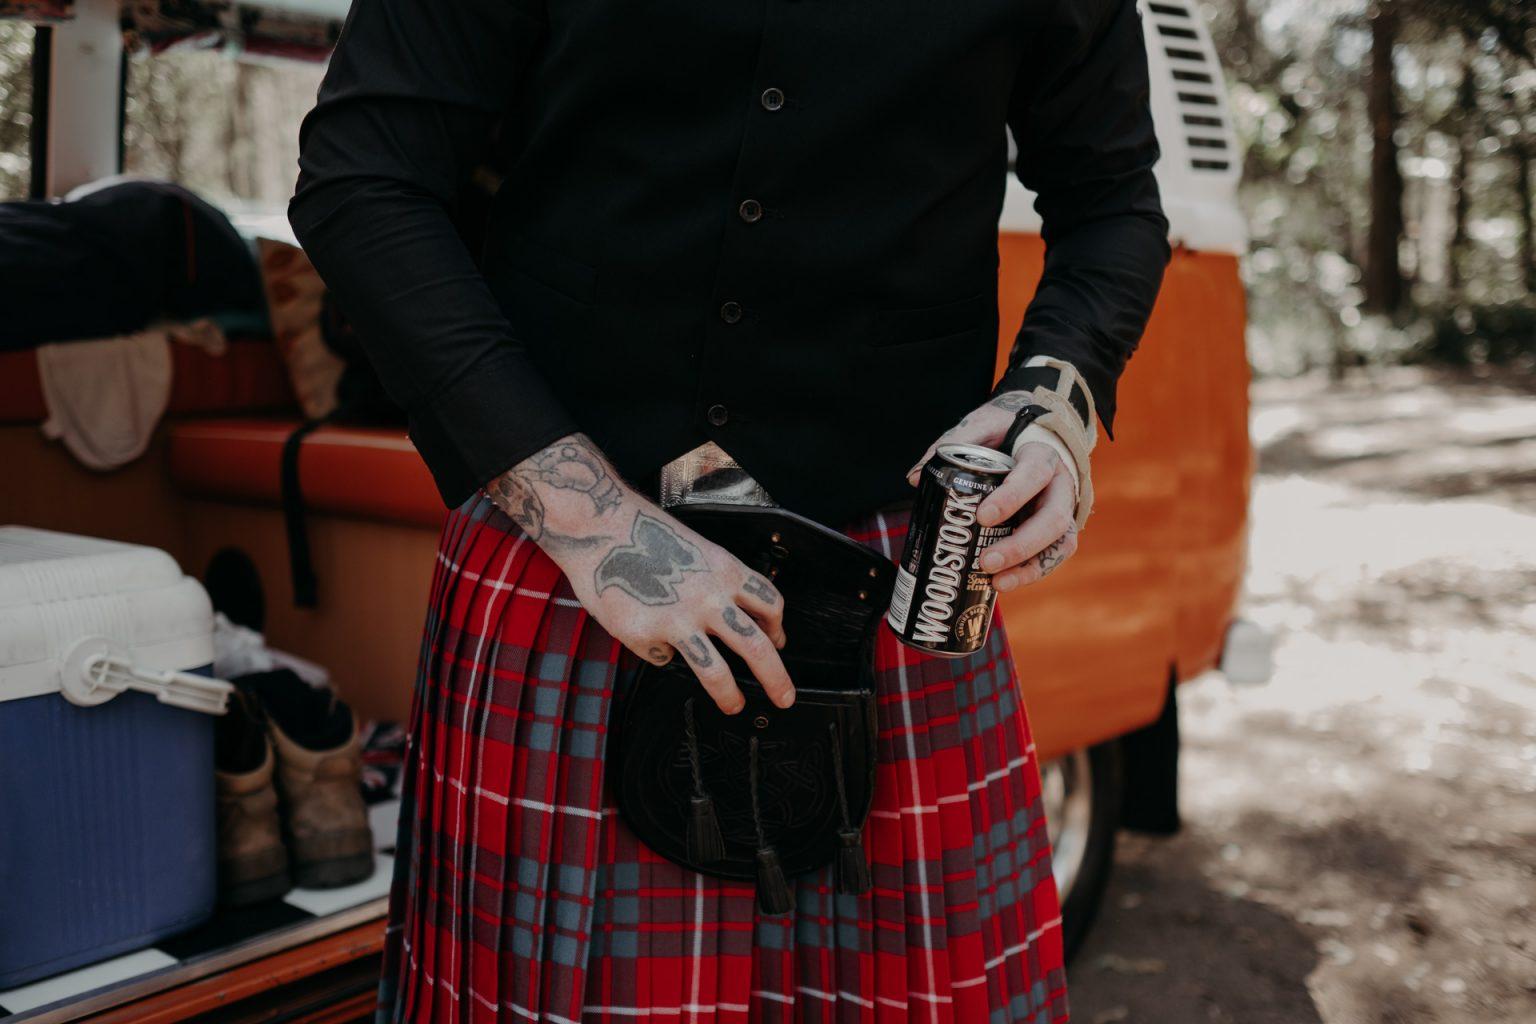 tattooed man putting on kilt